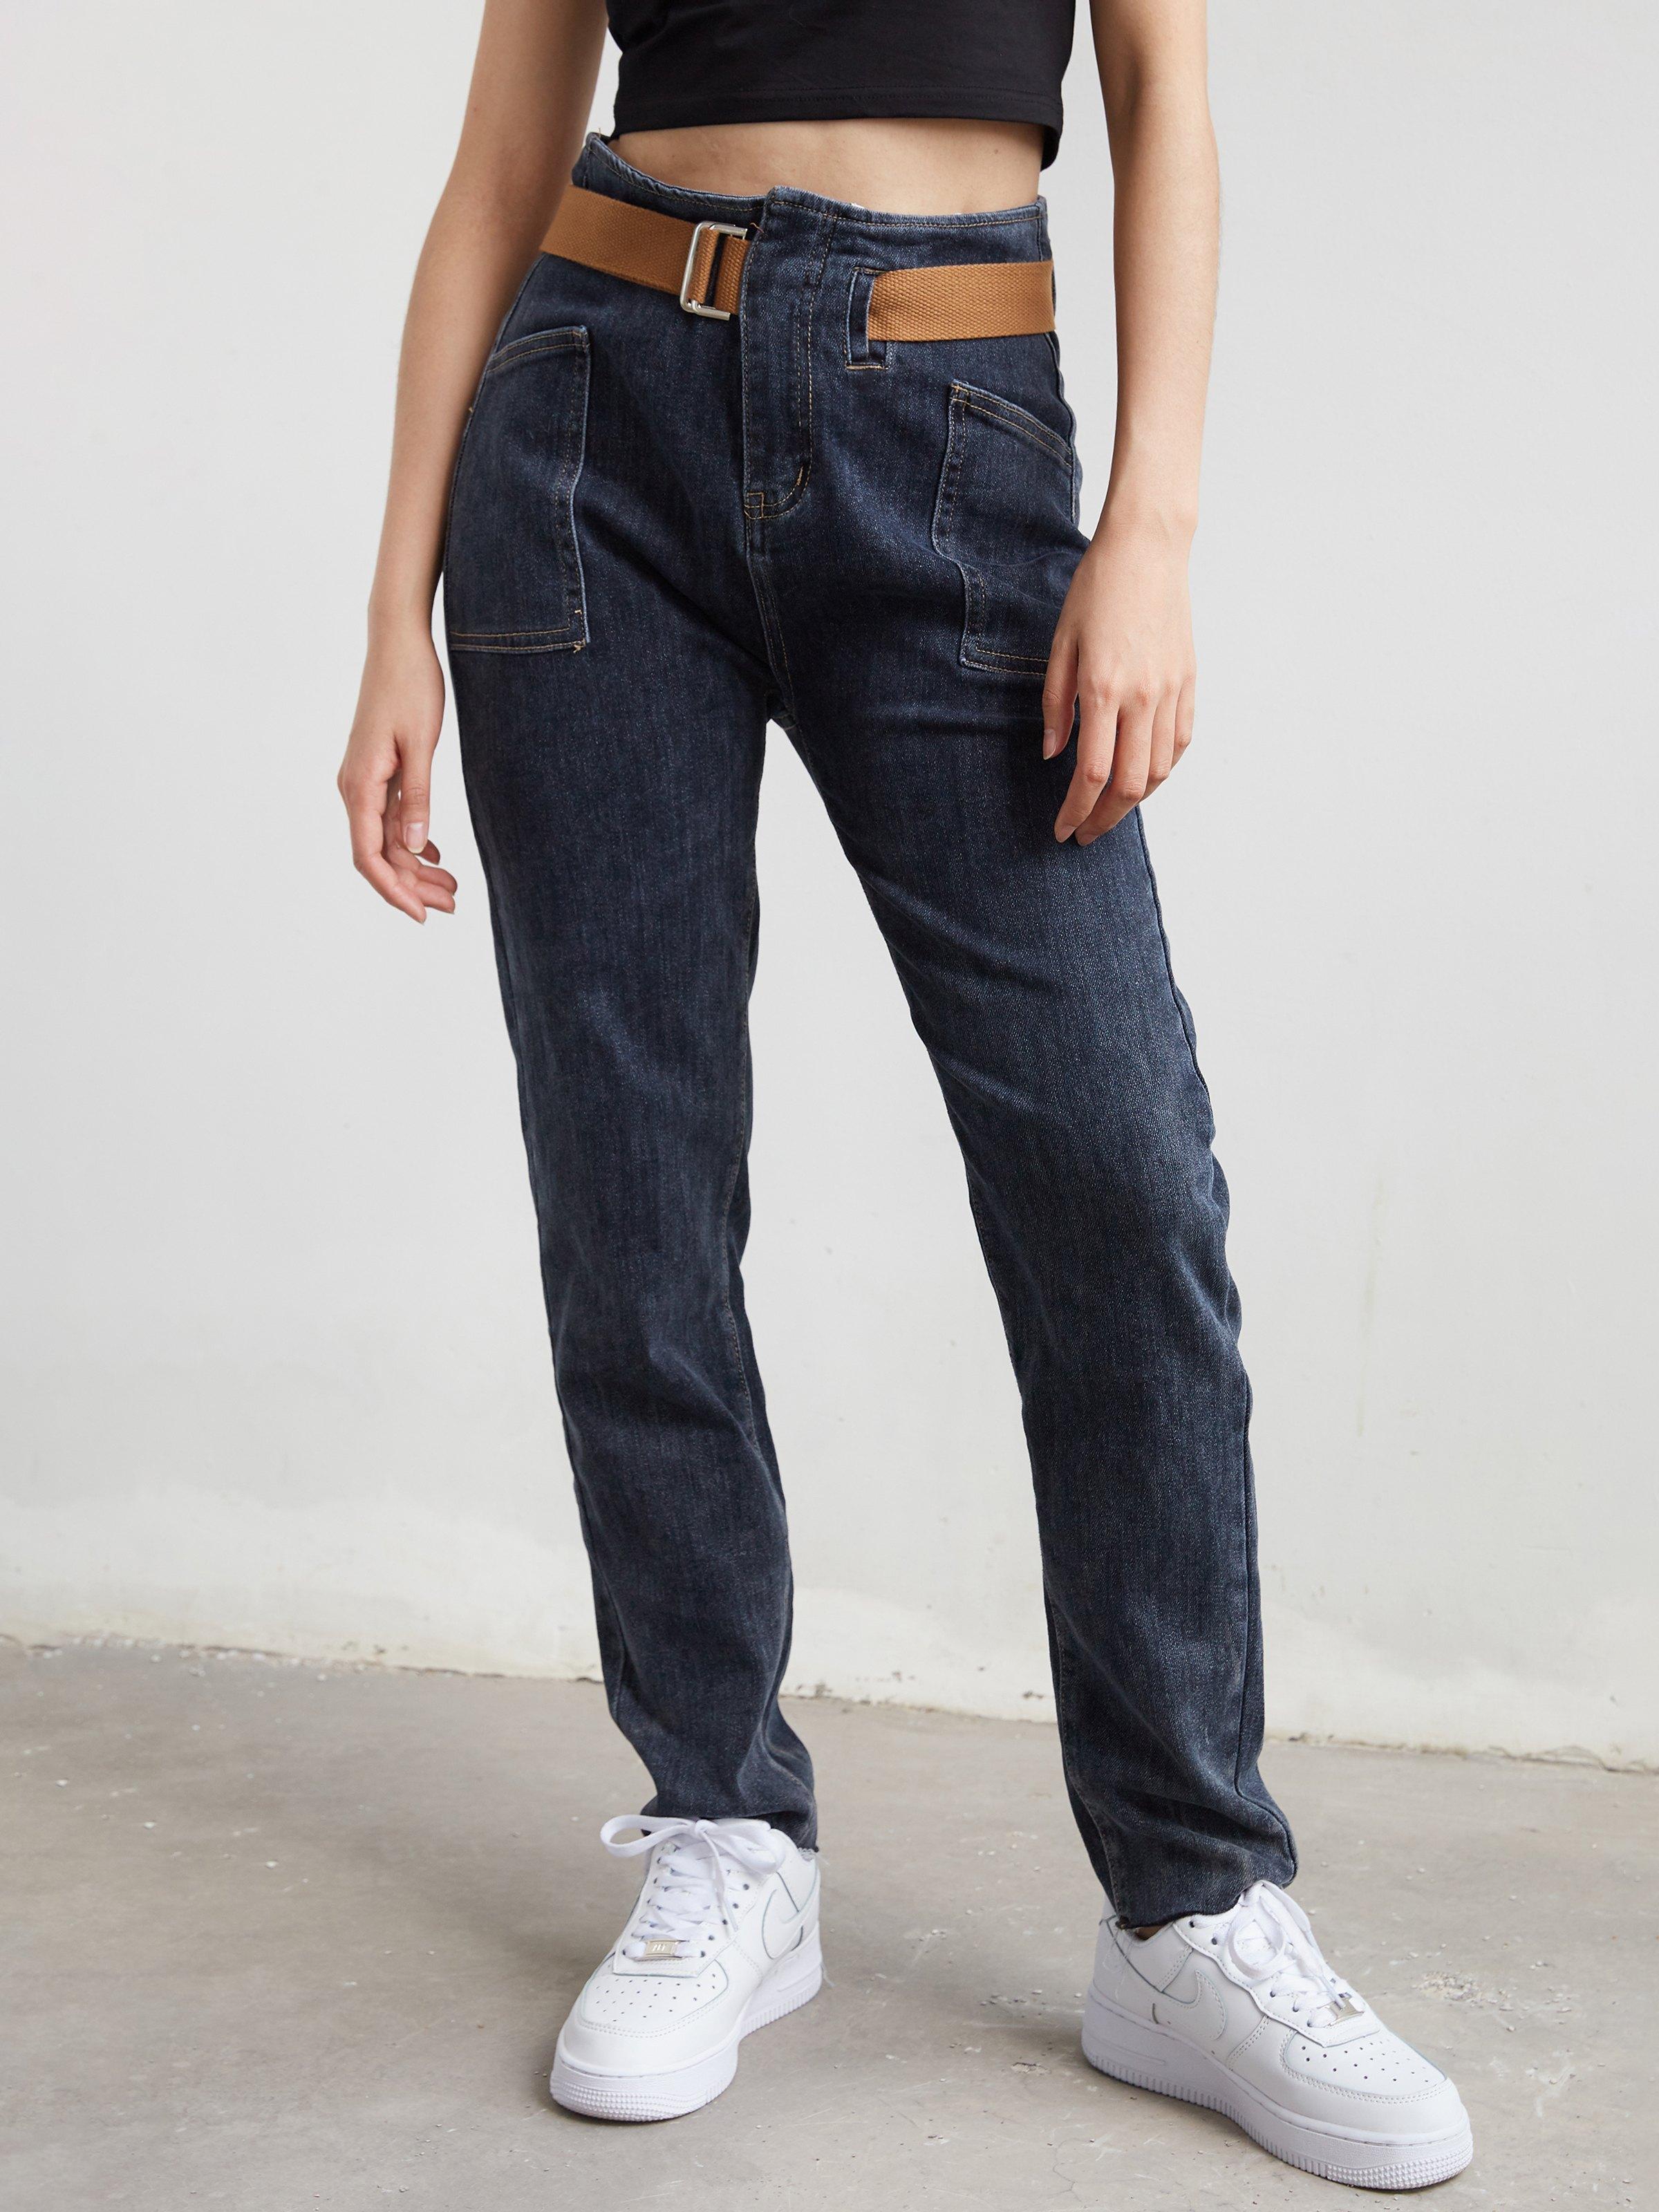 Belt Detail Cargo Jeans - Navy Blue XL